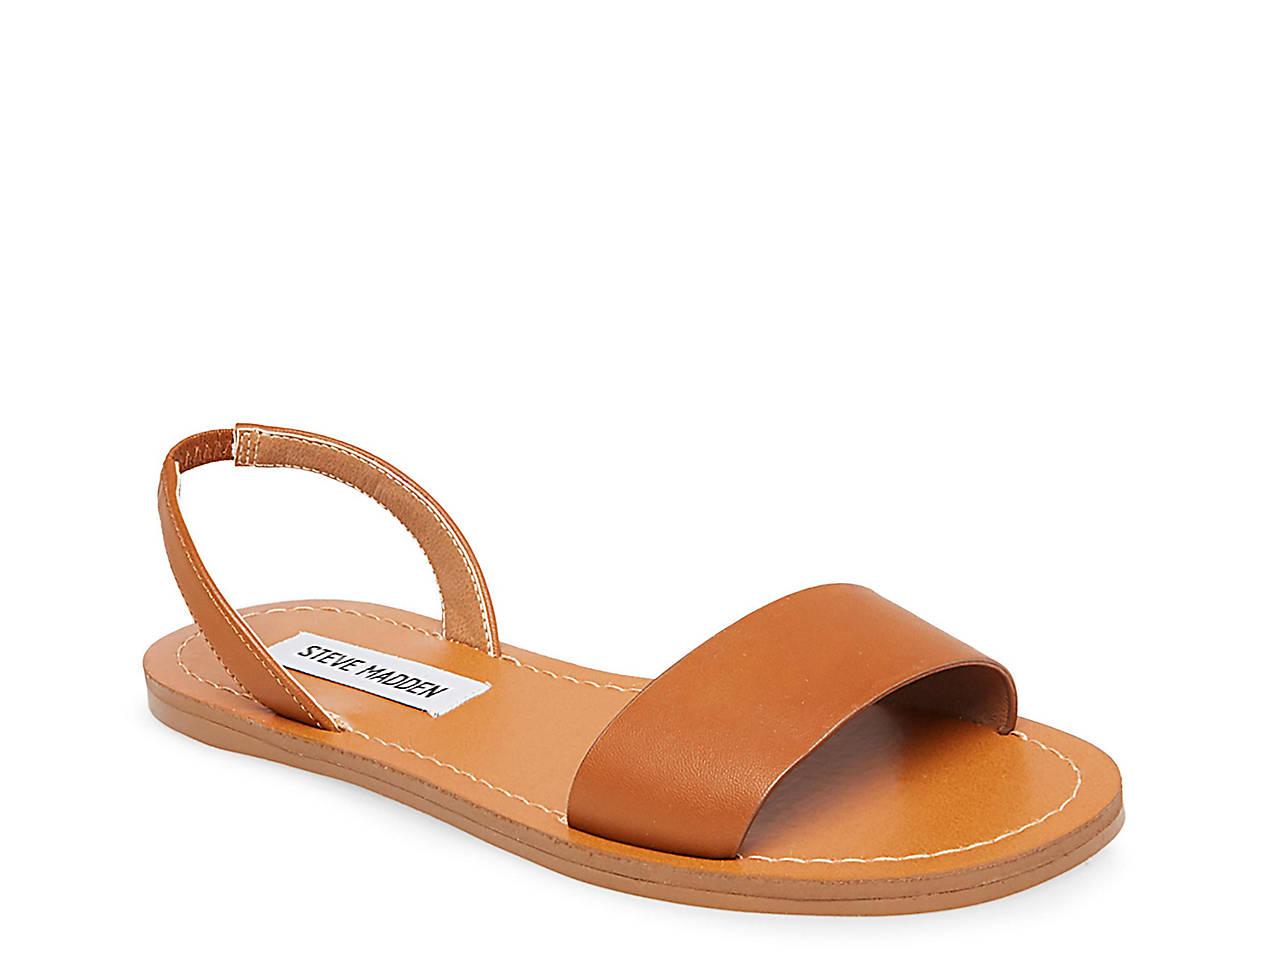 Alina Slingback Sandals gypIE